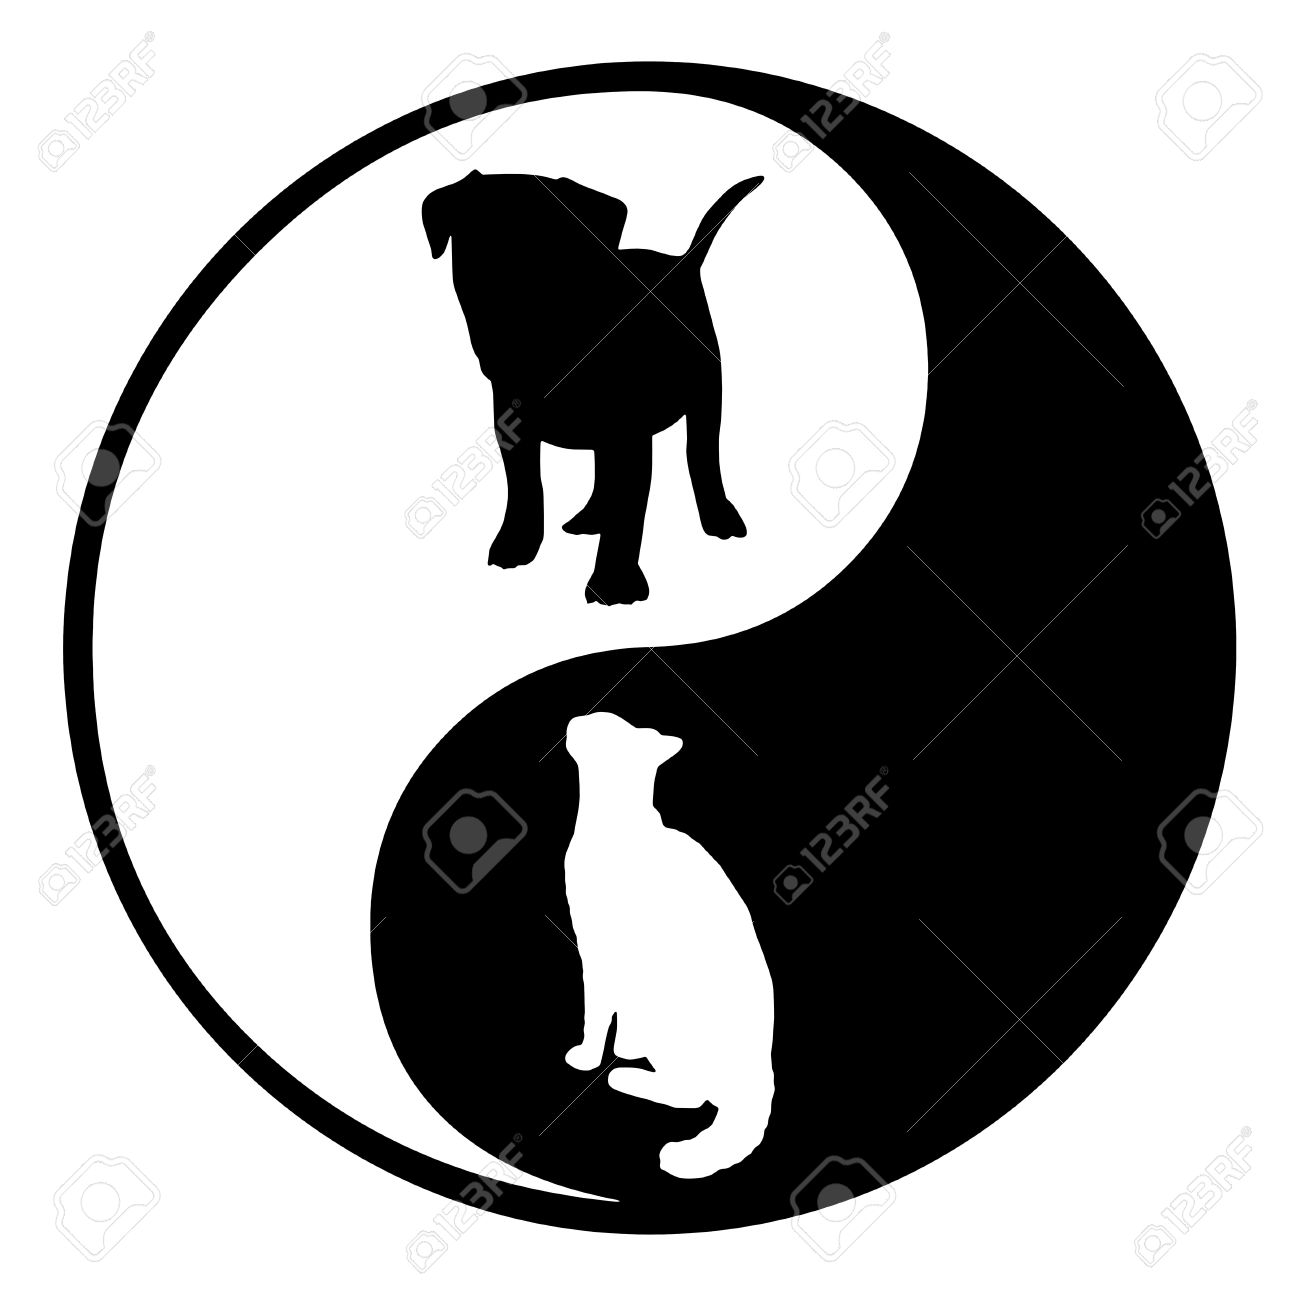 Illustration of a yin yang symbol with a silhouette cat and dog illustration of a yin yang symbol with a silhouette cat and dog stock illustration 18316399 buycottarizona Choice Image